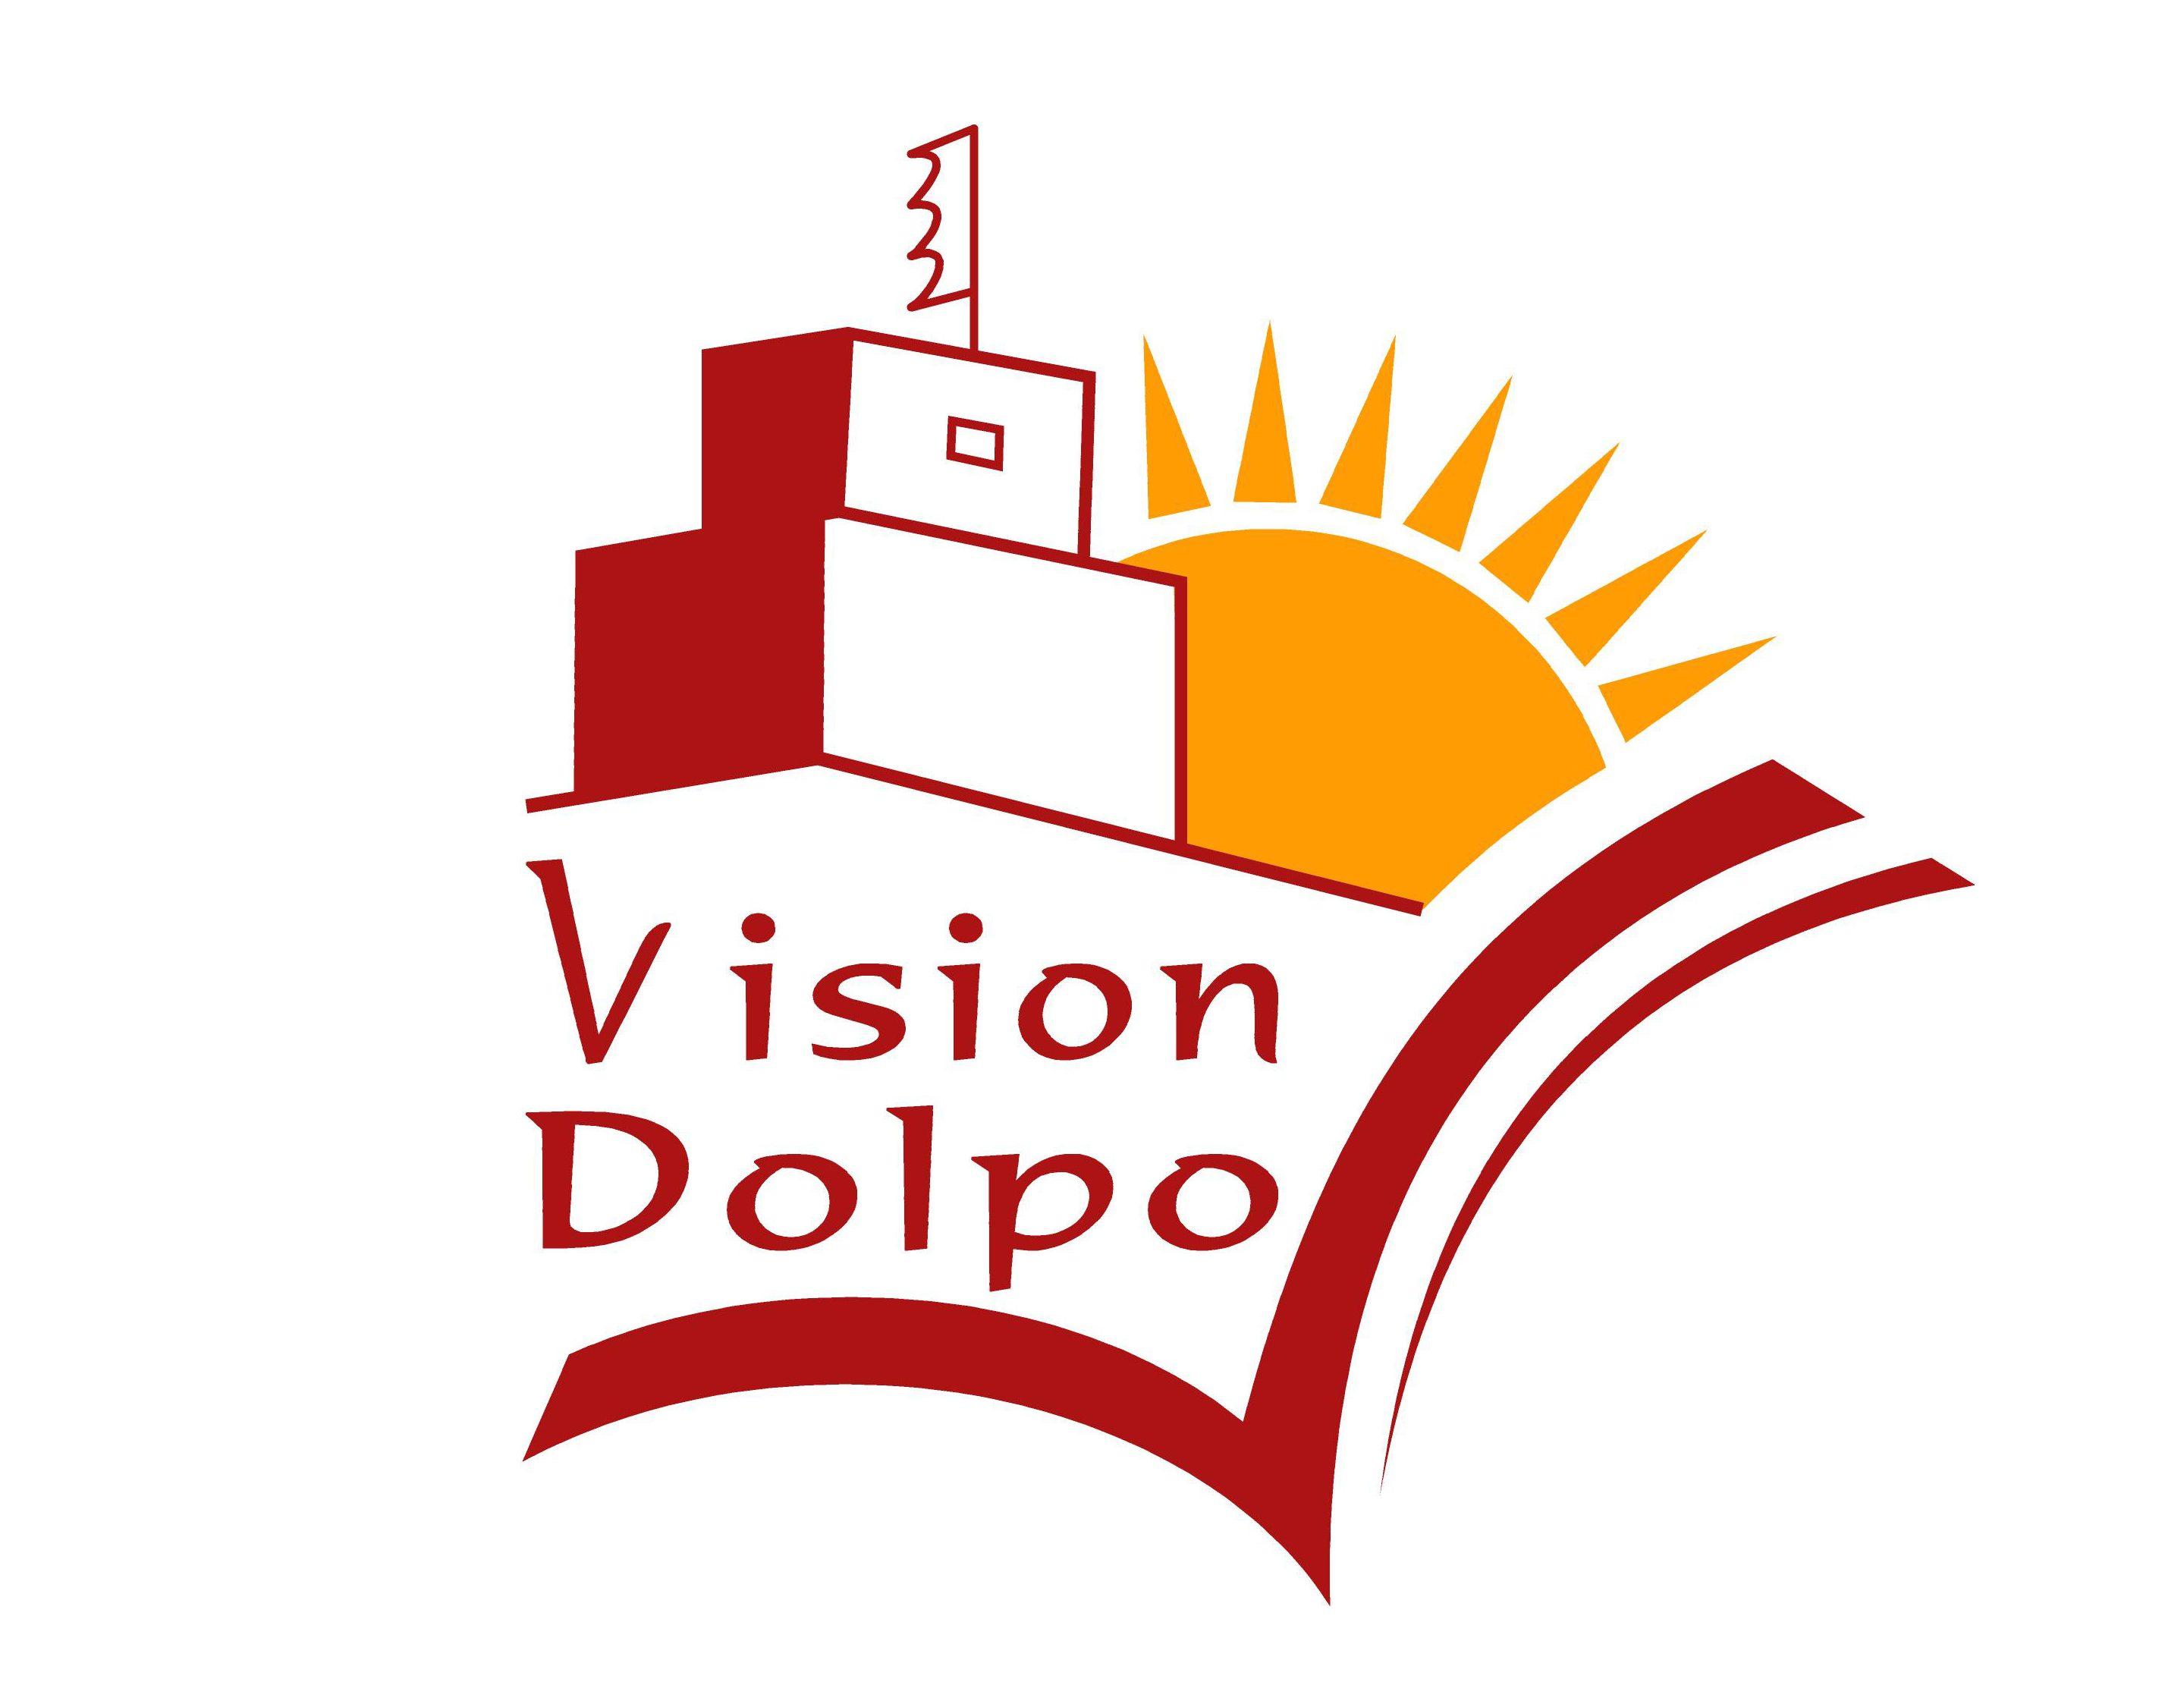 Vision Dolpo